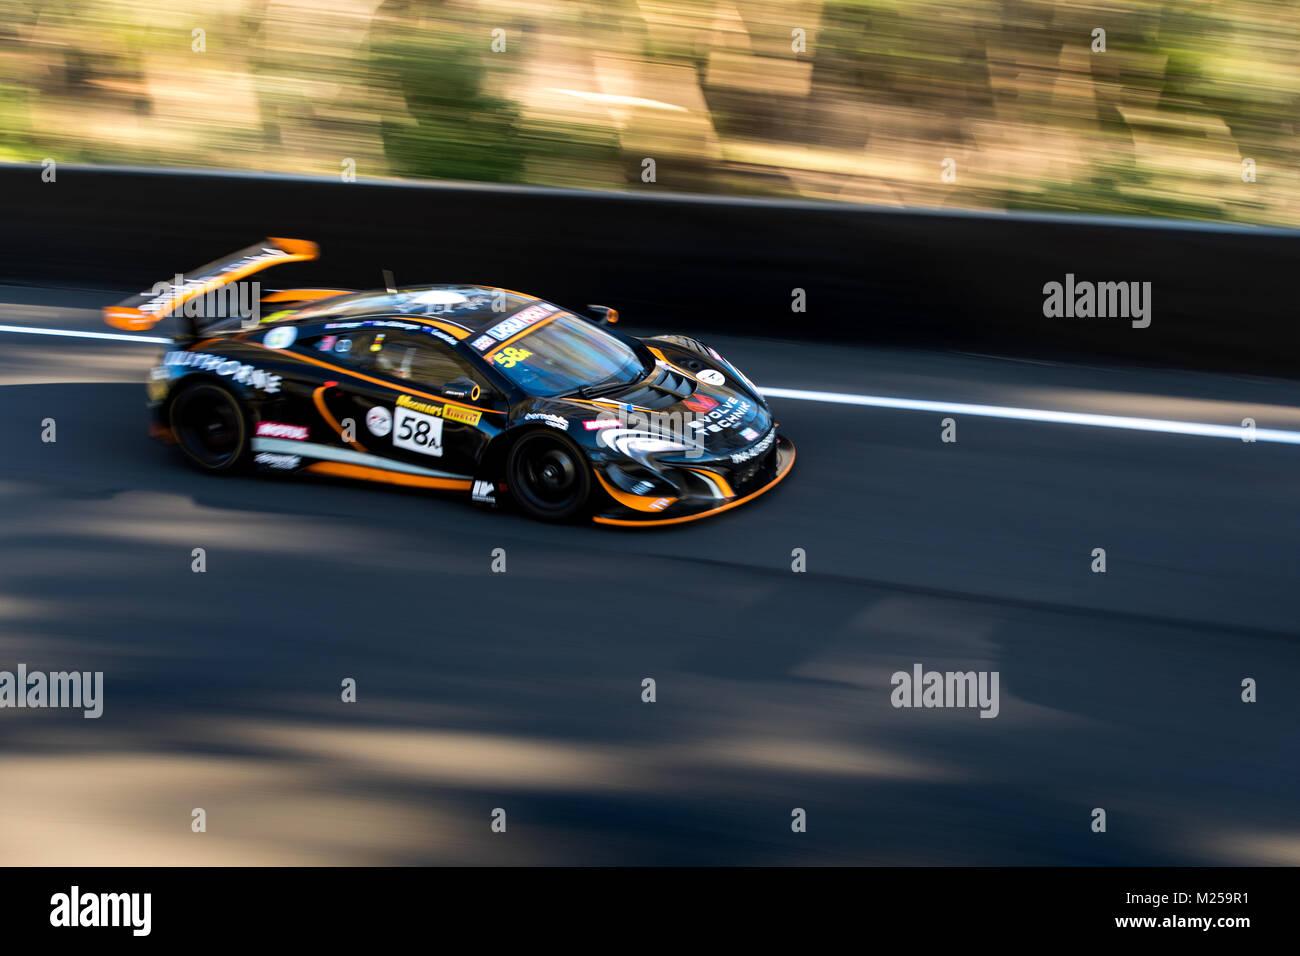 Mount Panorama Circuit, New South Wales, Australien. 05-02-2108. YNA Autosport - Craig Lowndes - McLaren 650 S GT3. Stockbild